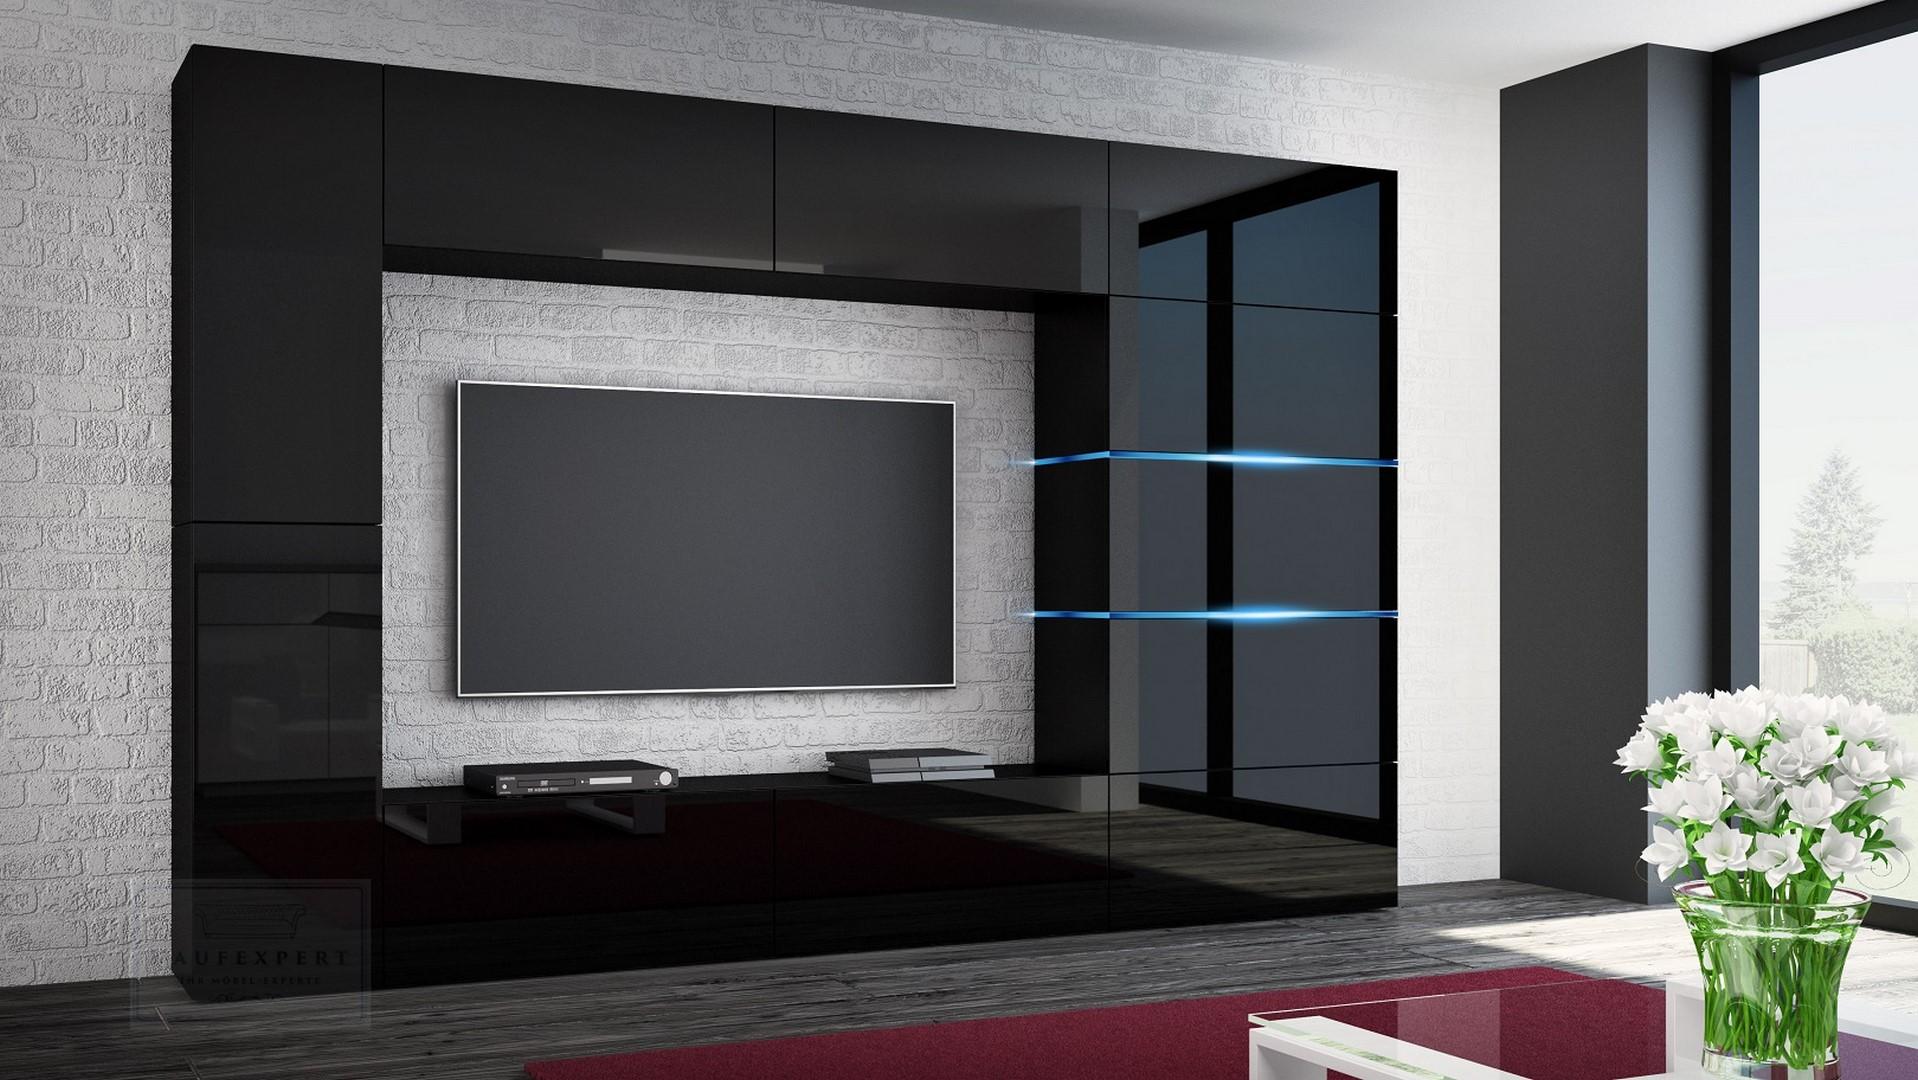 kaufexpert wohnwand shadow schwarz hochglanz 285 cm mediawand anbauwand medienwand design. Black Bedroom Furniture Sets. Home Design Ideas